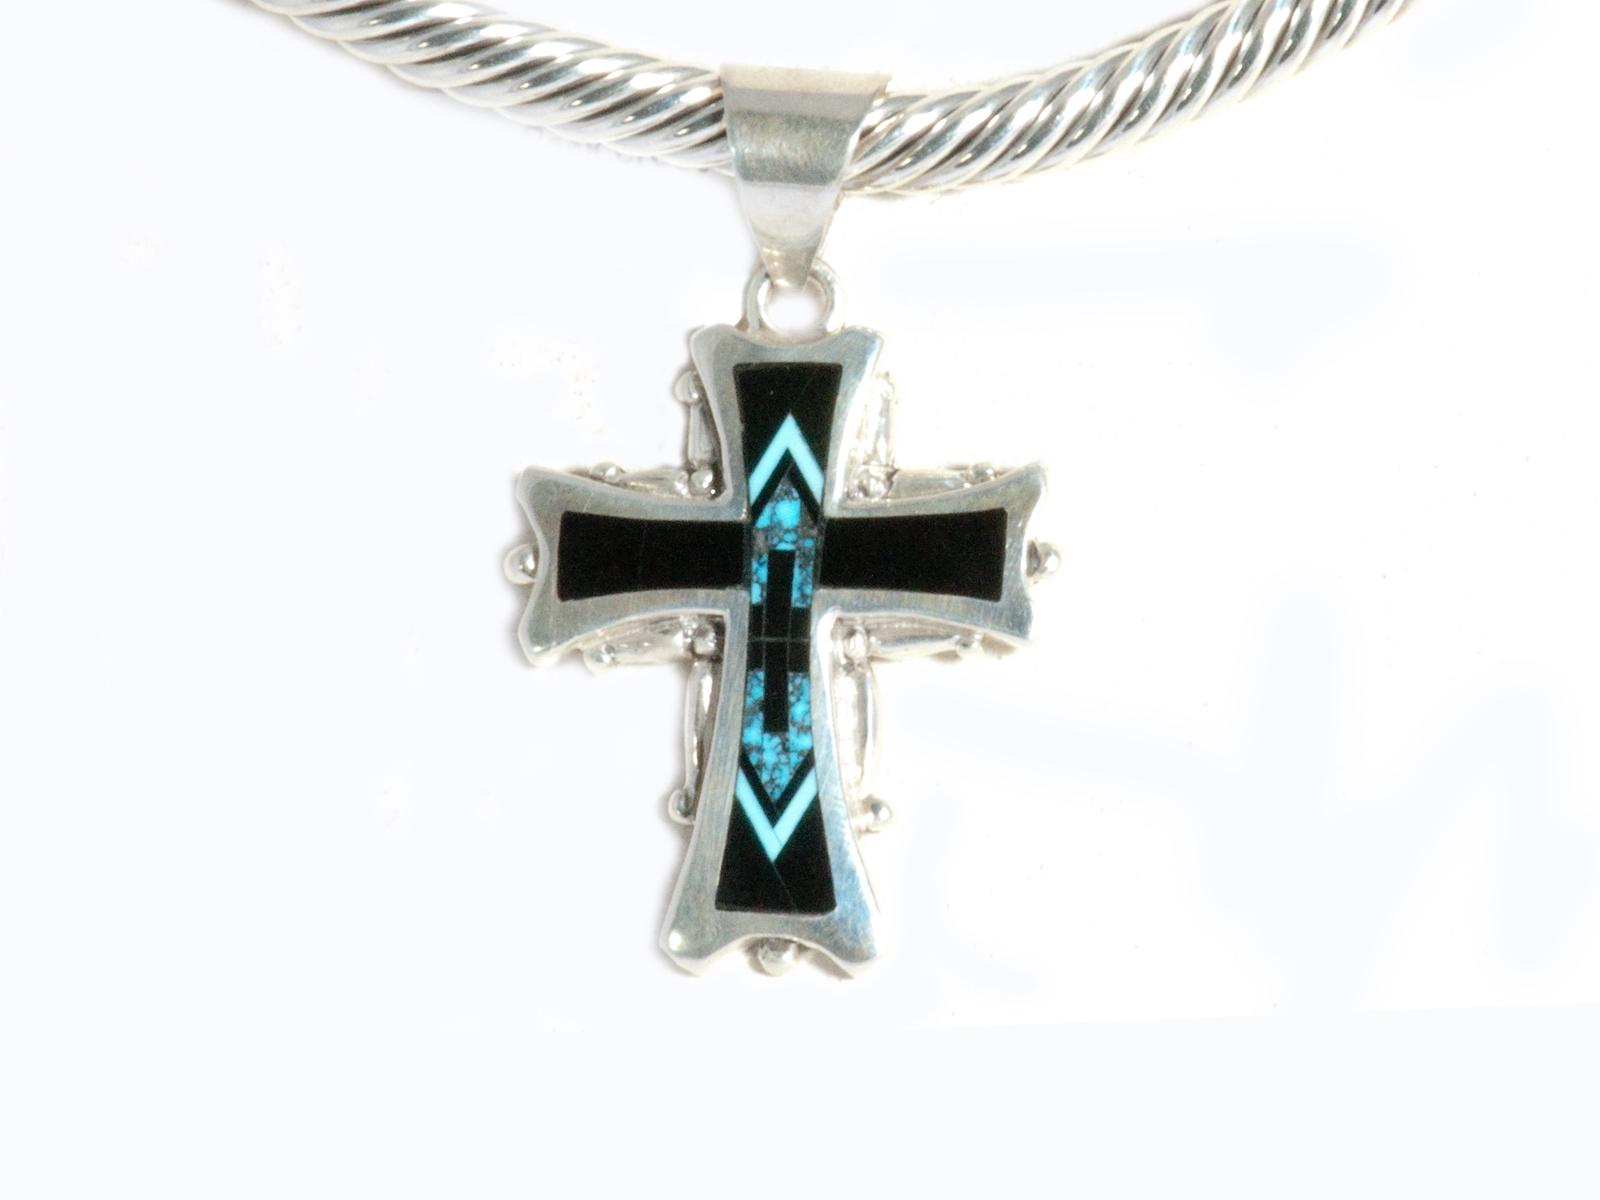 Ithica Peak Turquoise Black Jade Inlay Cross pendant